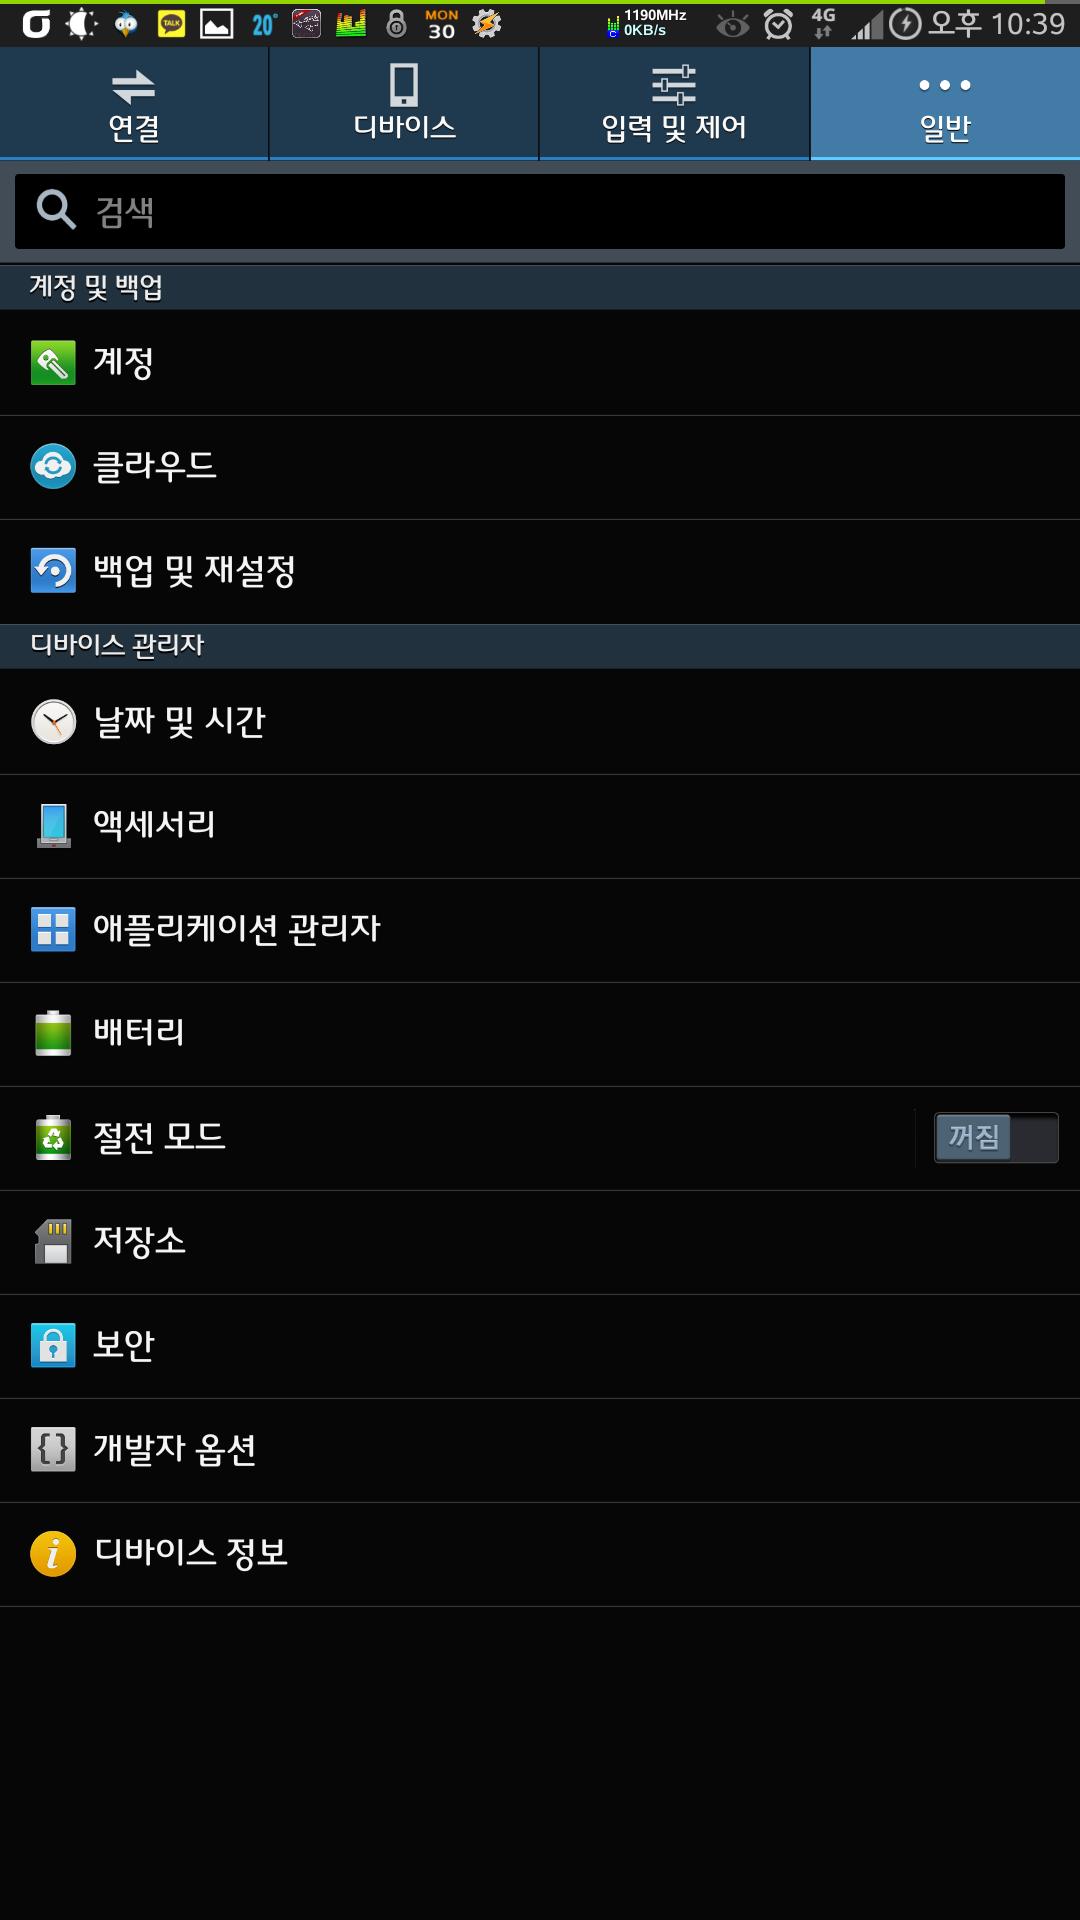 Screenshot_2013-09-30-22-39-11.png